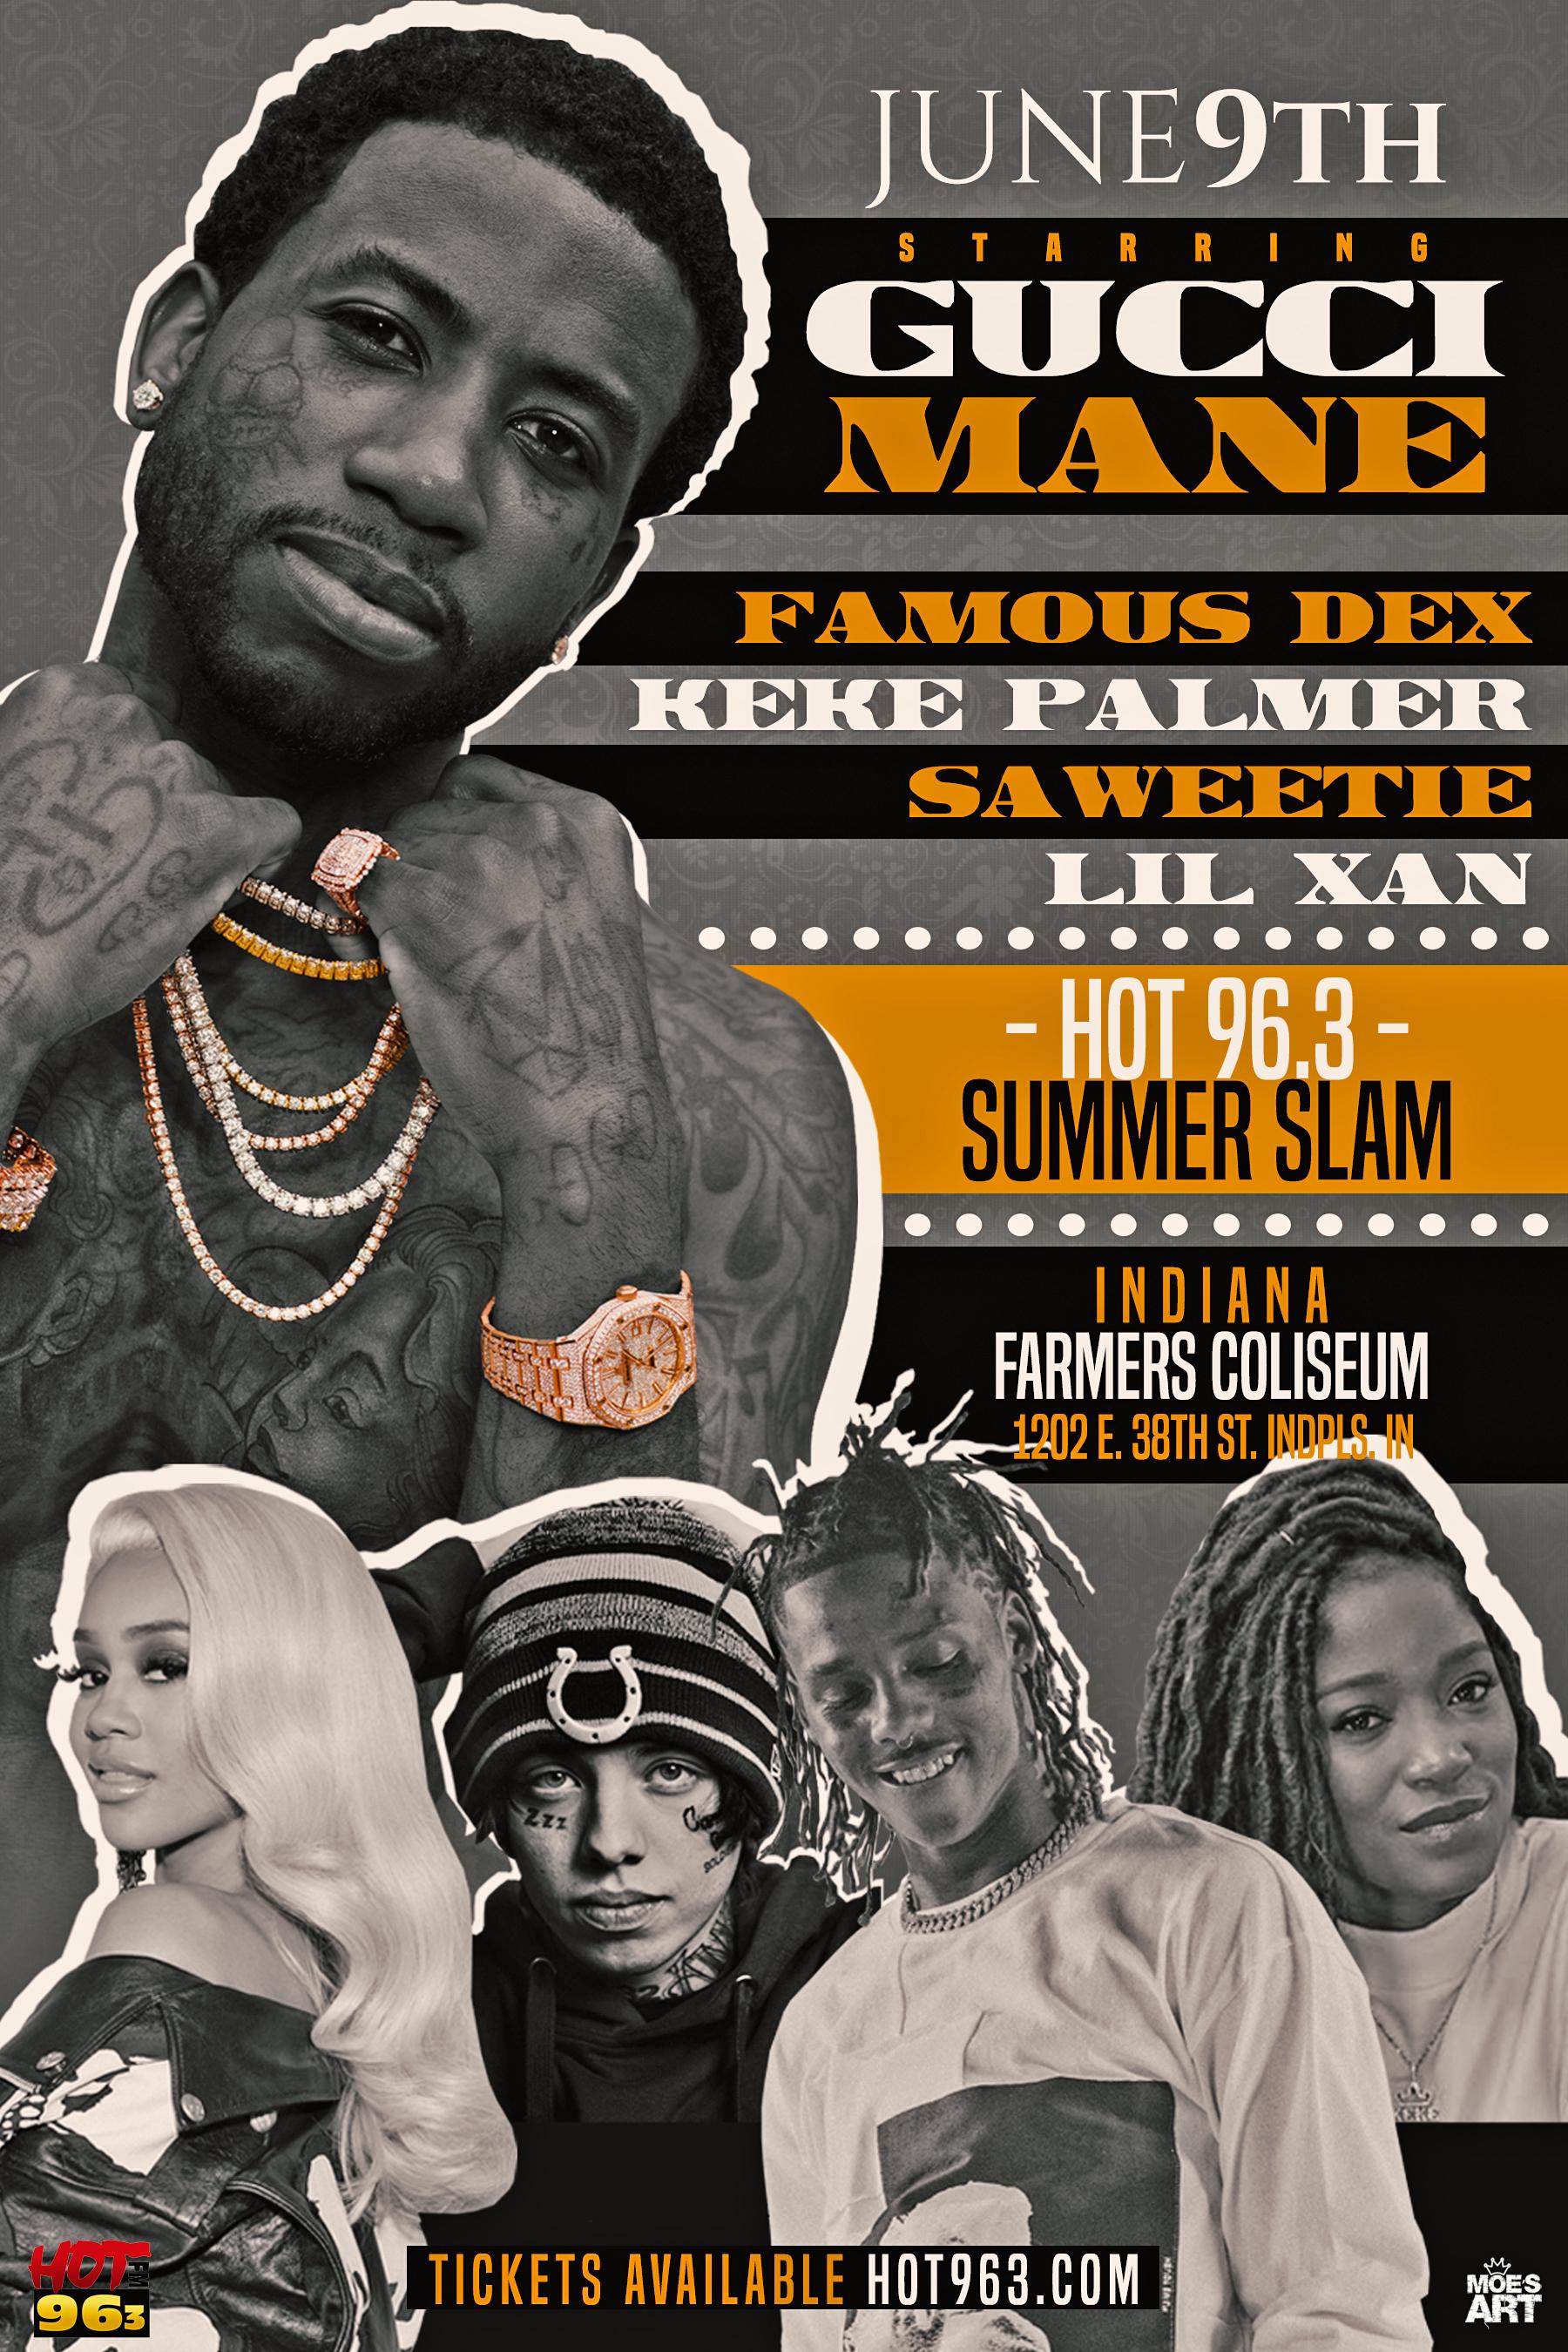 Hot 96.3 Summer Slam Graphic 2